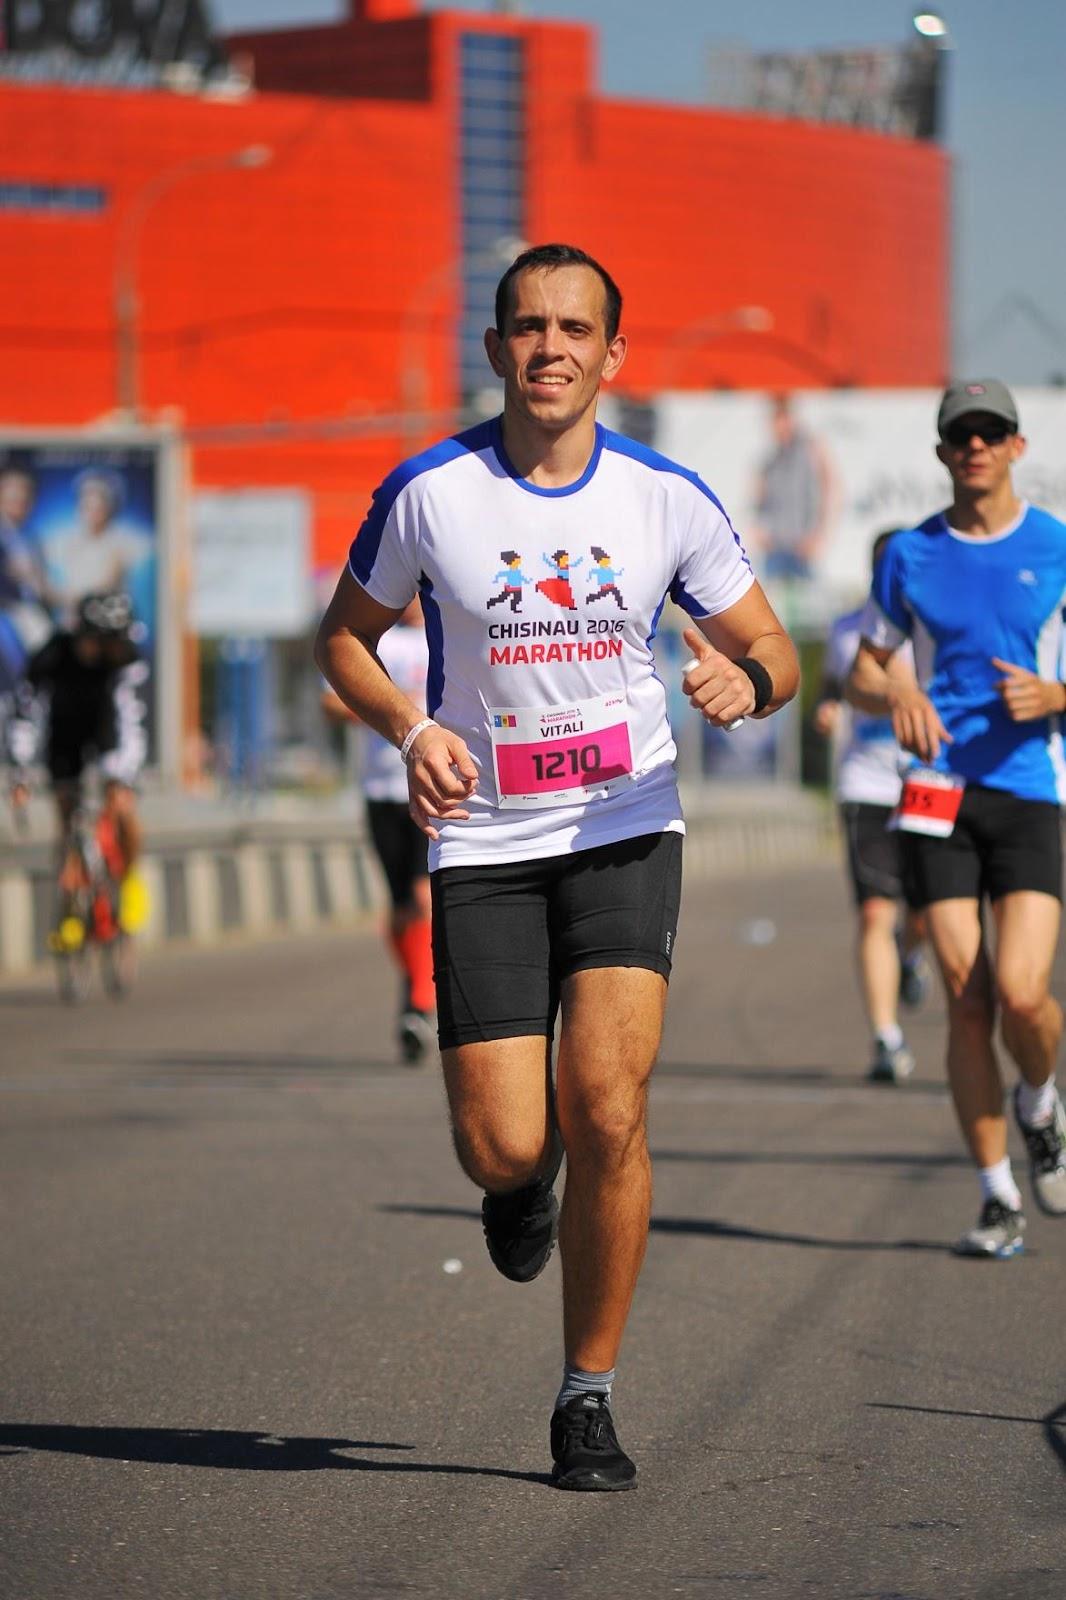 D:\Спортер\Chisinau Marathon 2016\bcc176ac707953c11fb579c354d48a4b.jpg